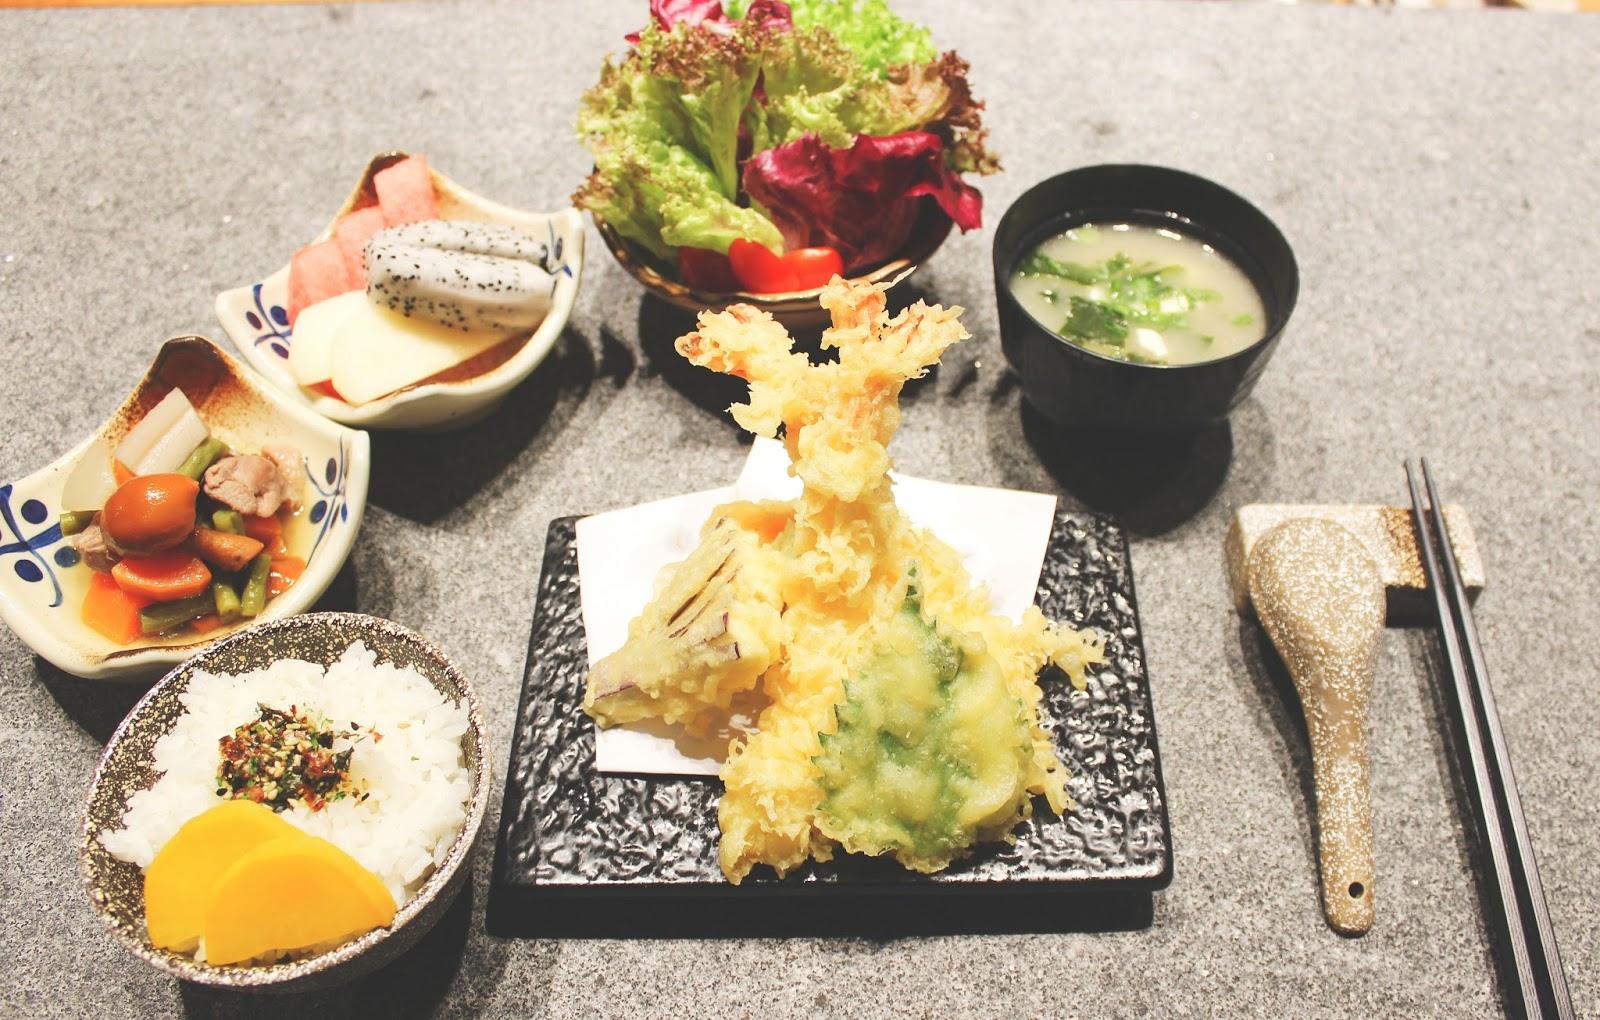 Tgm japanese korean cuisine terminal 2 singapore changi for Asian cuisine singapore